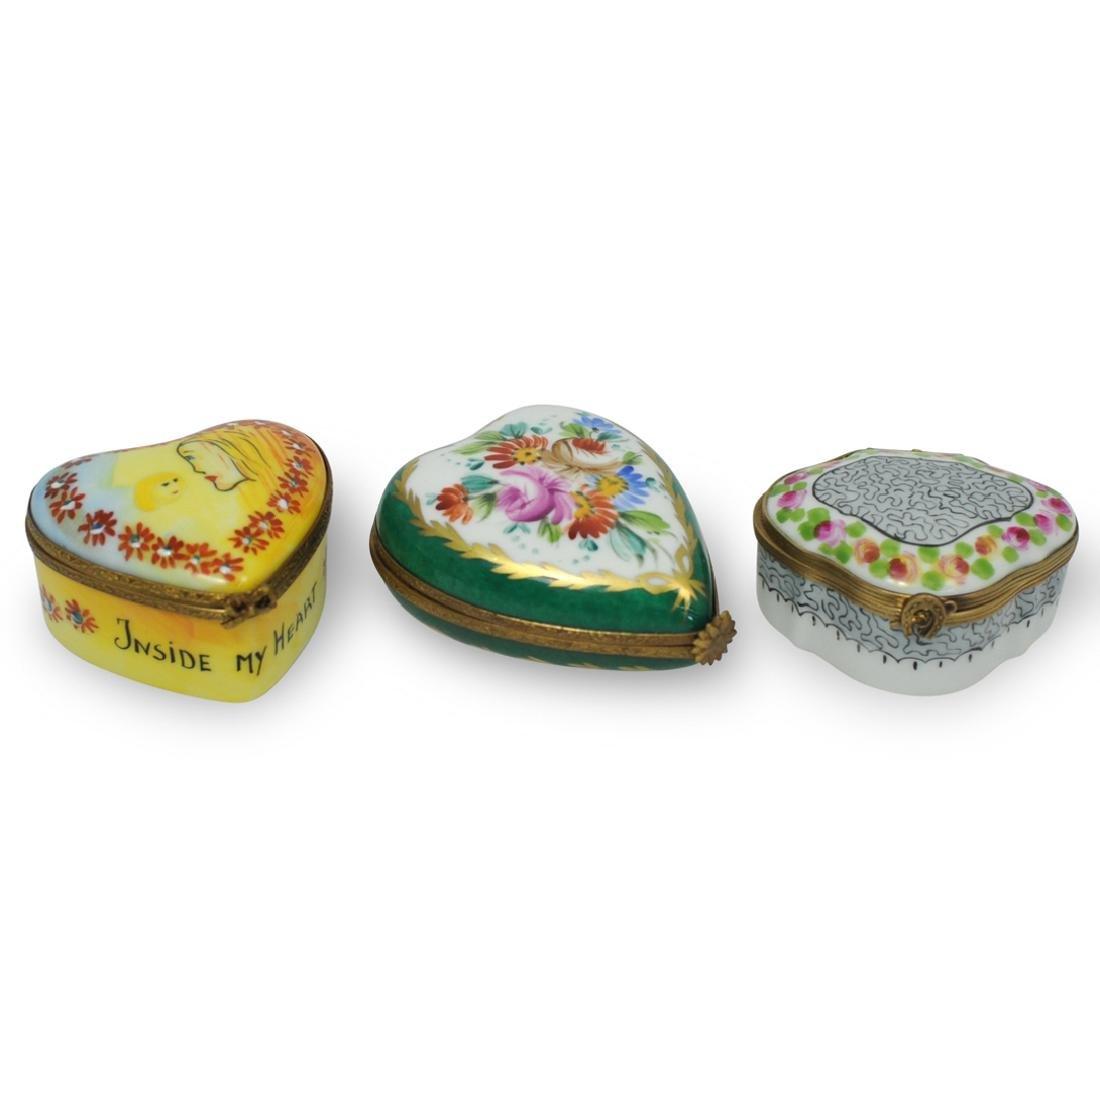 (3 Pc) Limoges Porcelain Trinket Boxes